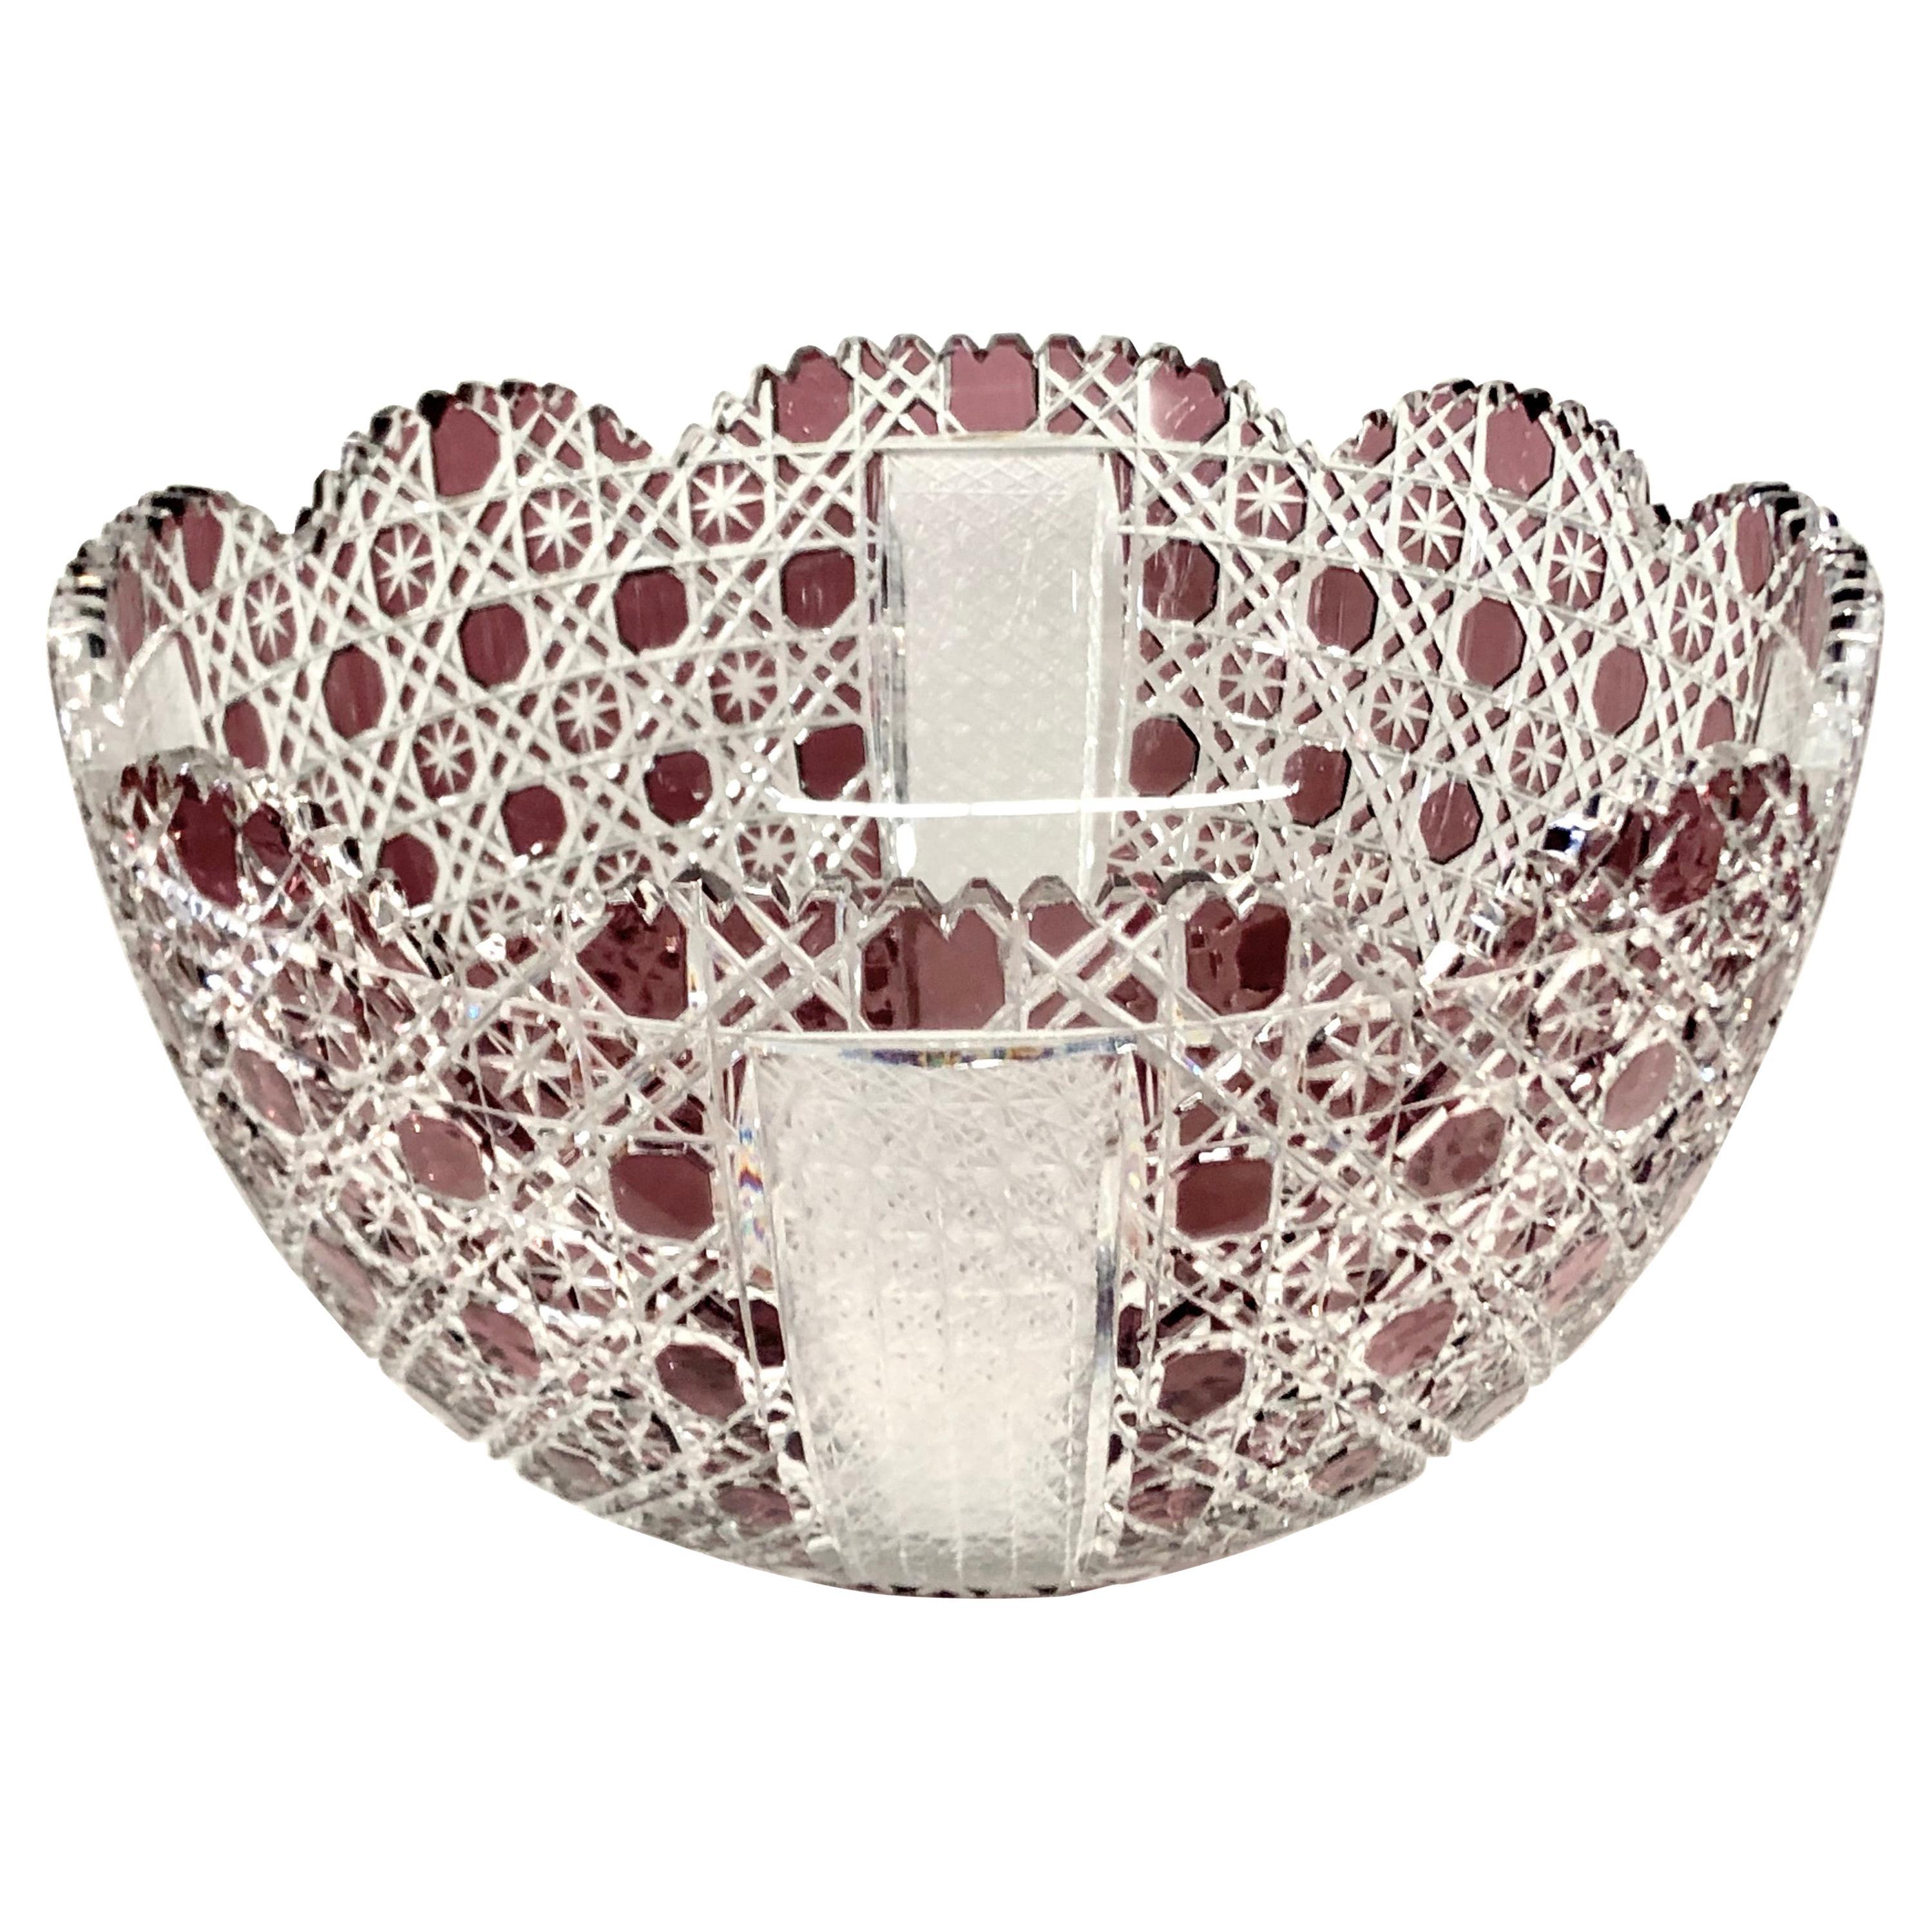 Fabulous Mid-Century Bohemian Amethyst/Cranberry Overlay Cut Crystal Punch Bowl